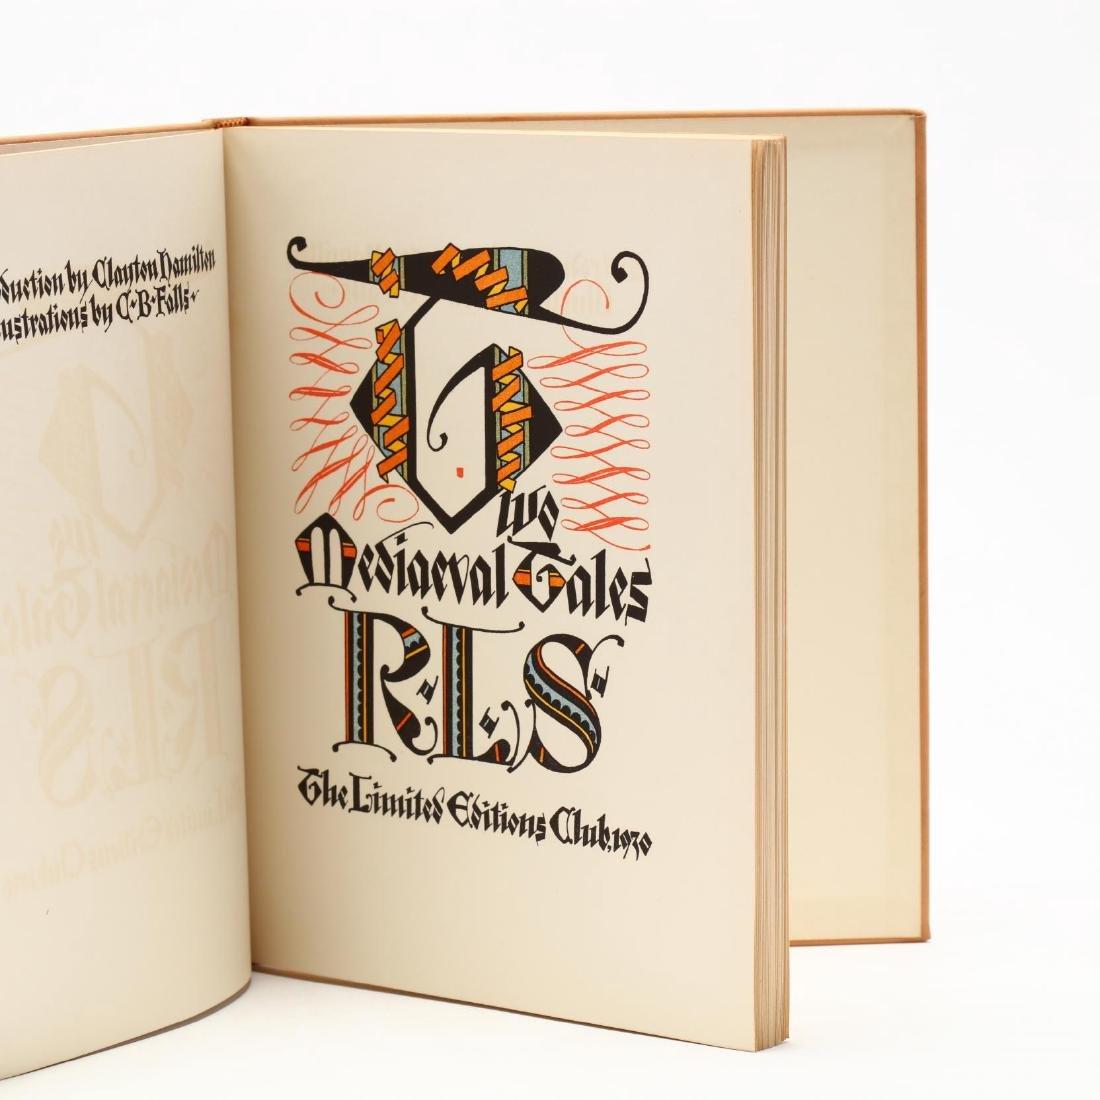 Three Prewar Limited Editions Club Slipcased Books With - 5